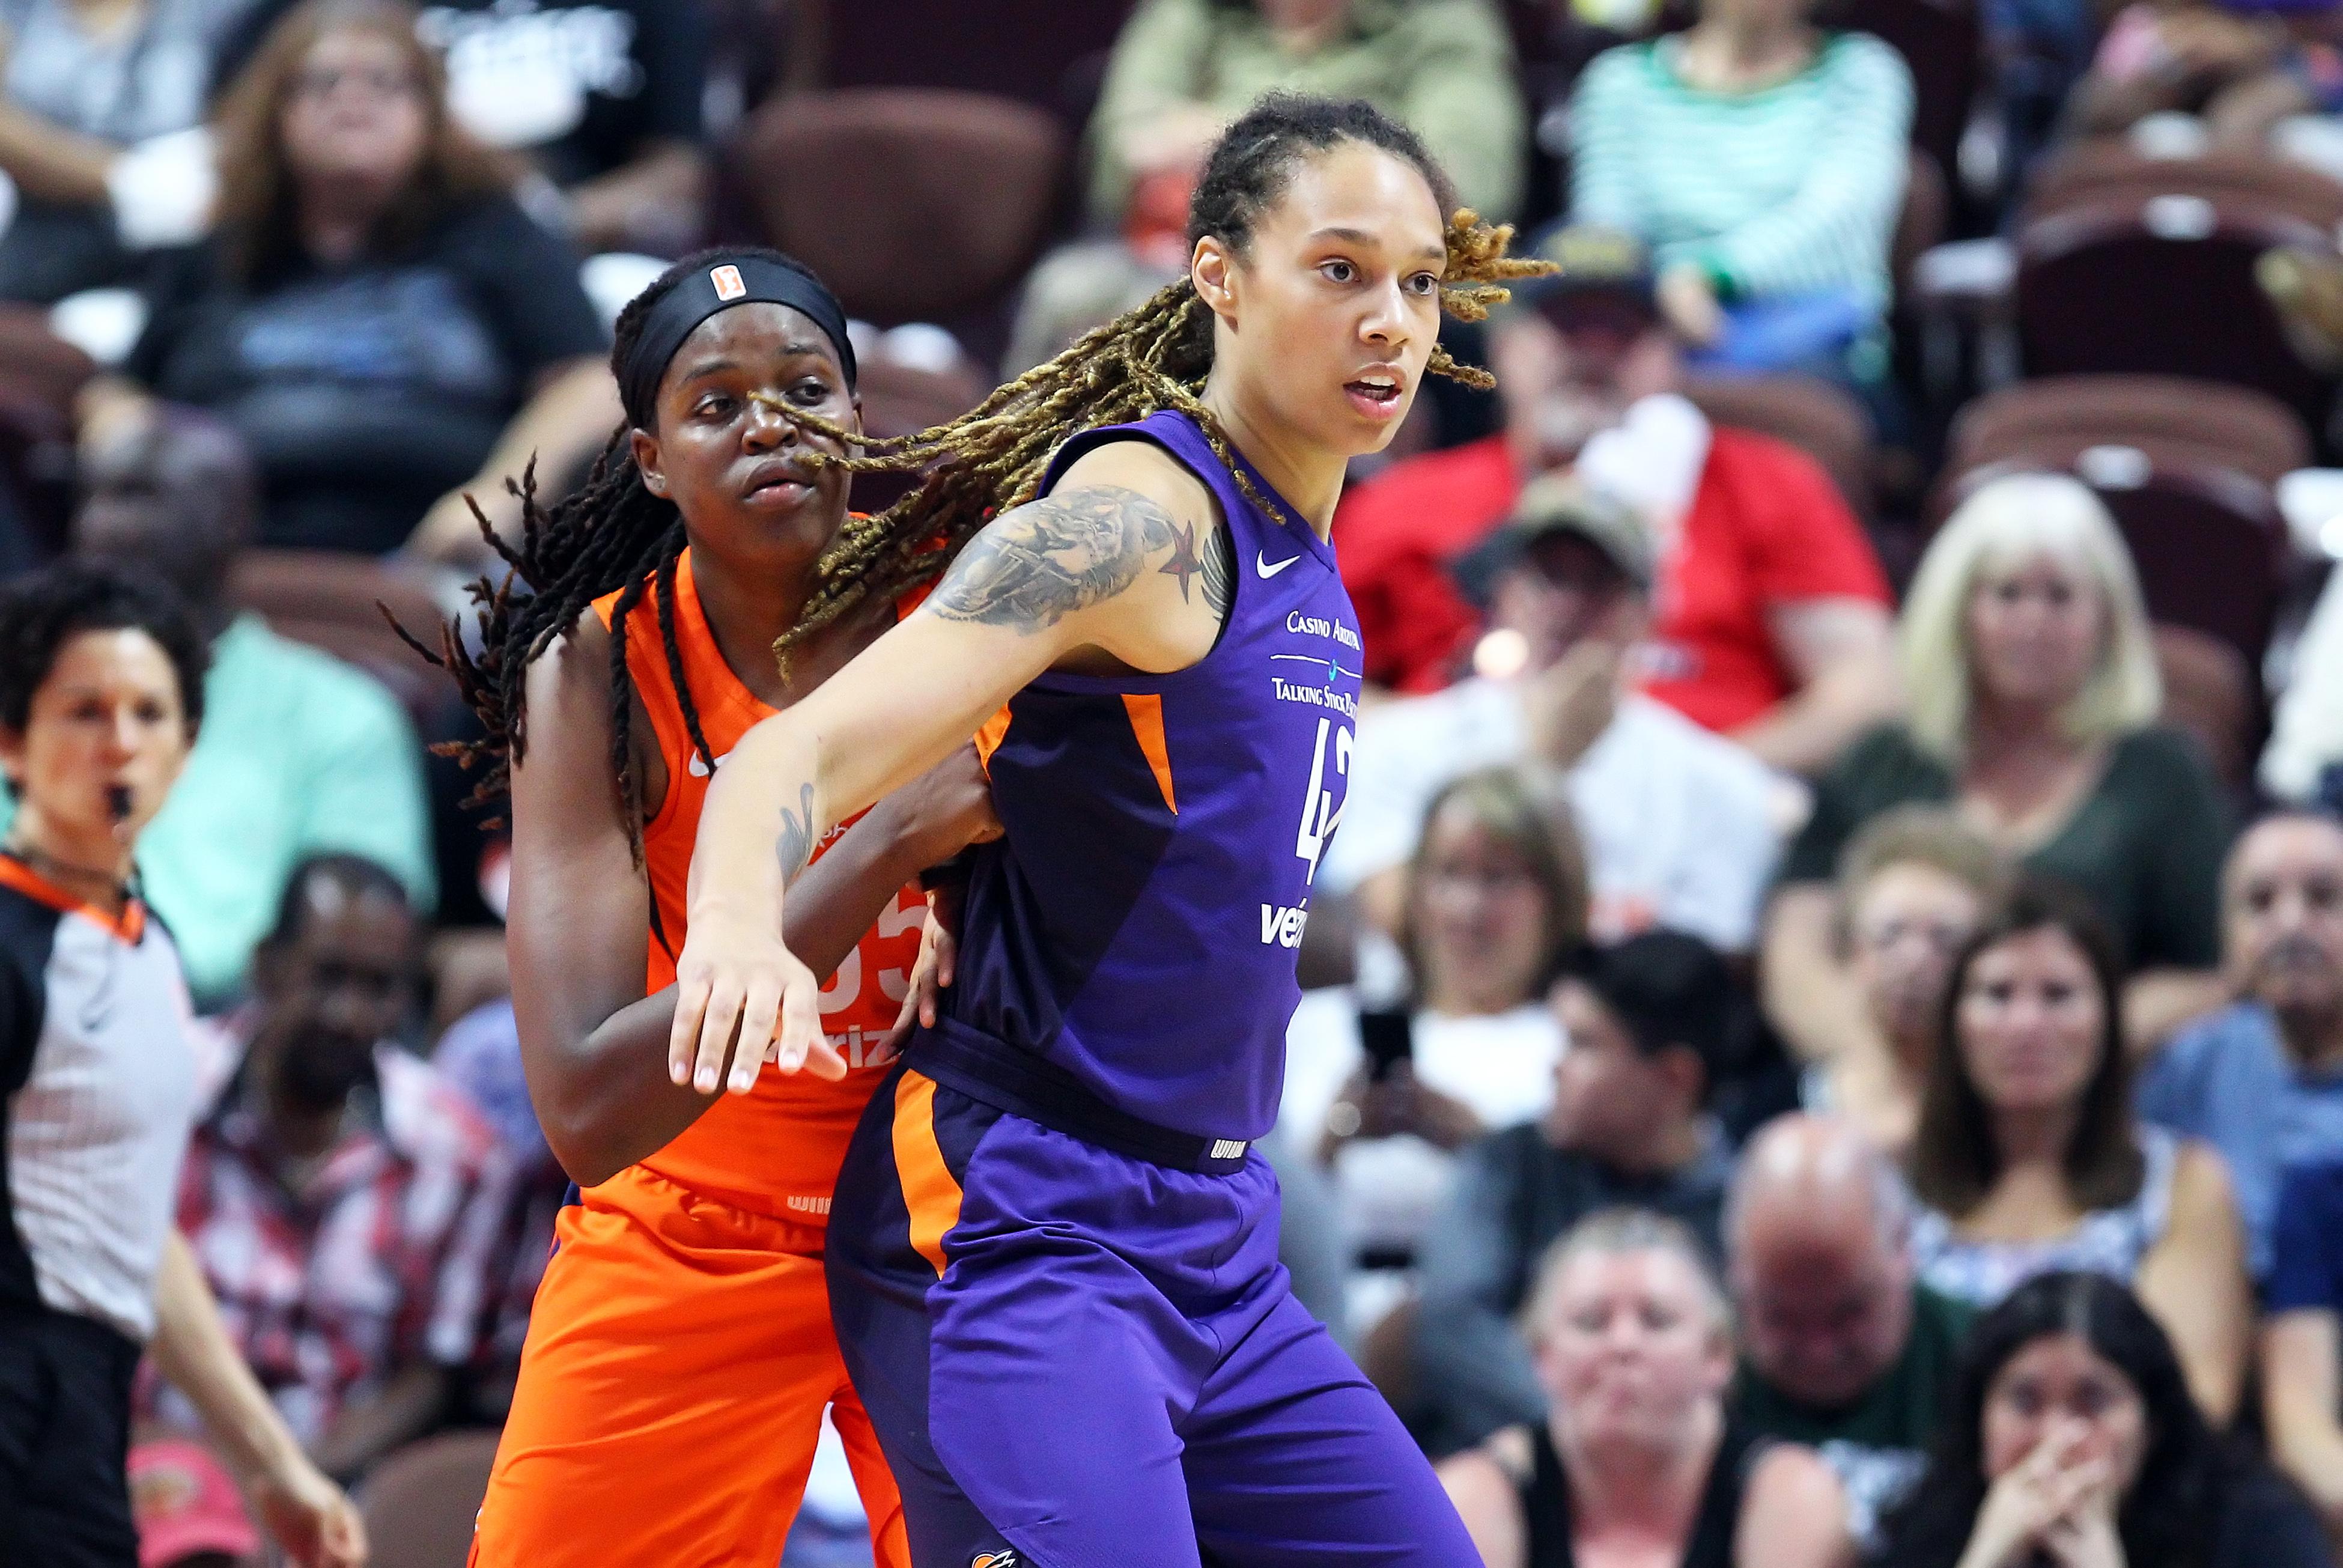 WNBA: AUG 23 Second Round Playoffs - Phoenix Mercury at Connecticut Sun